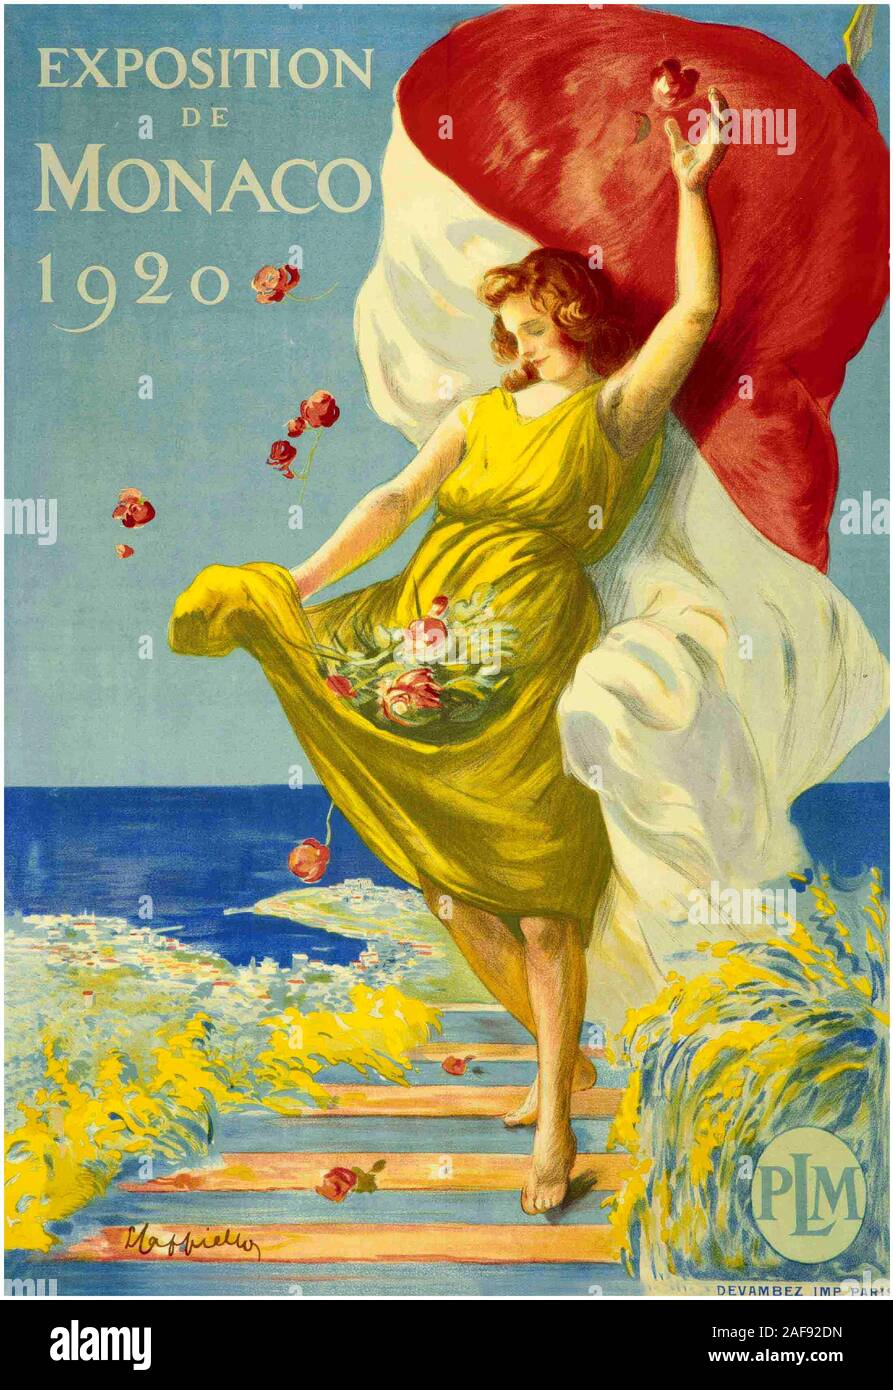 Monaco 0070 Vintage Travel Art Poster